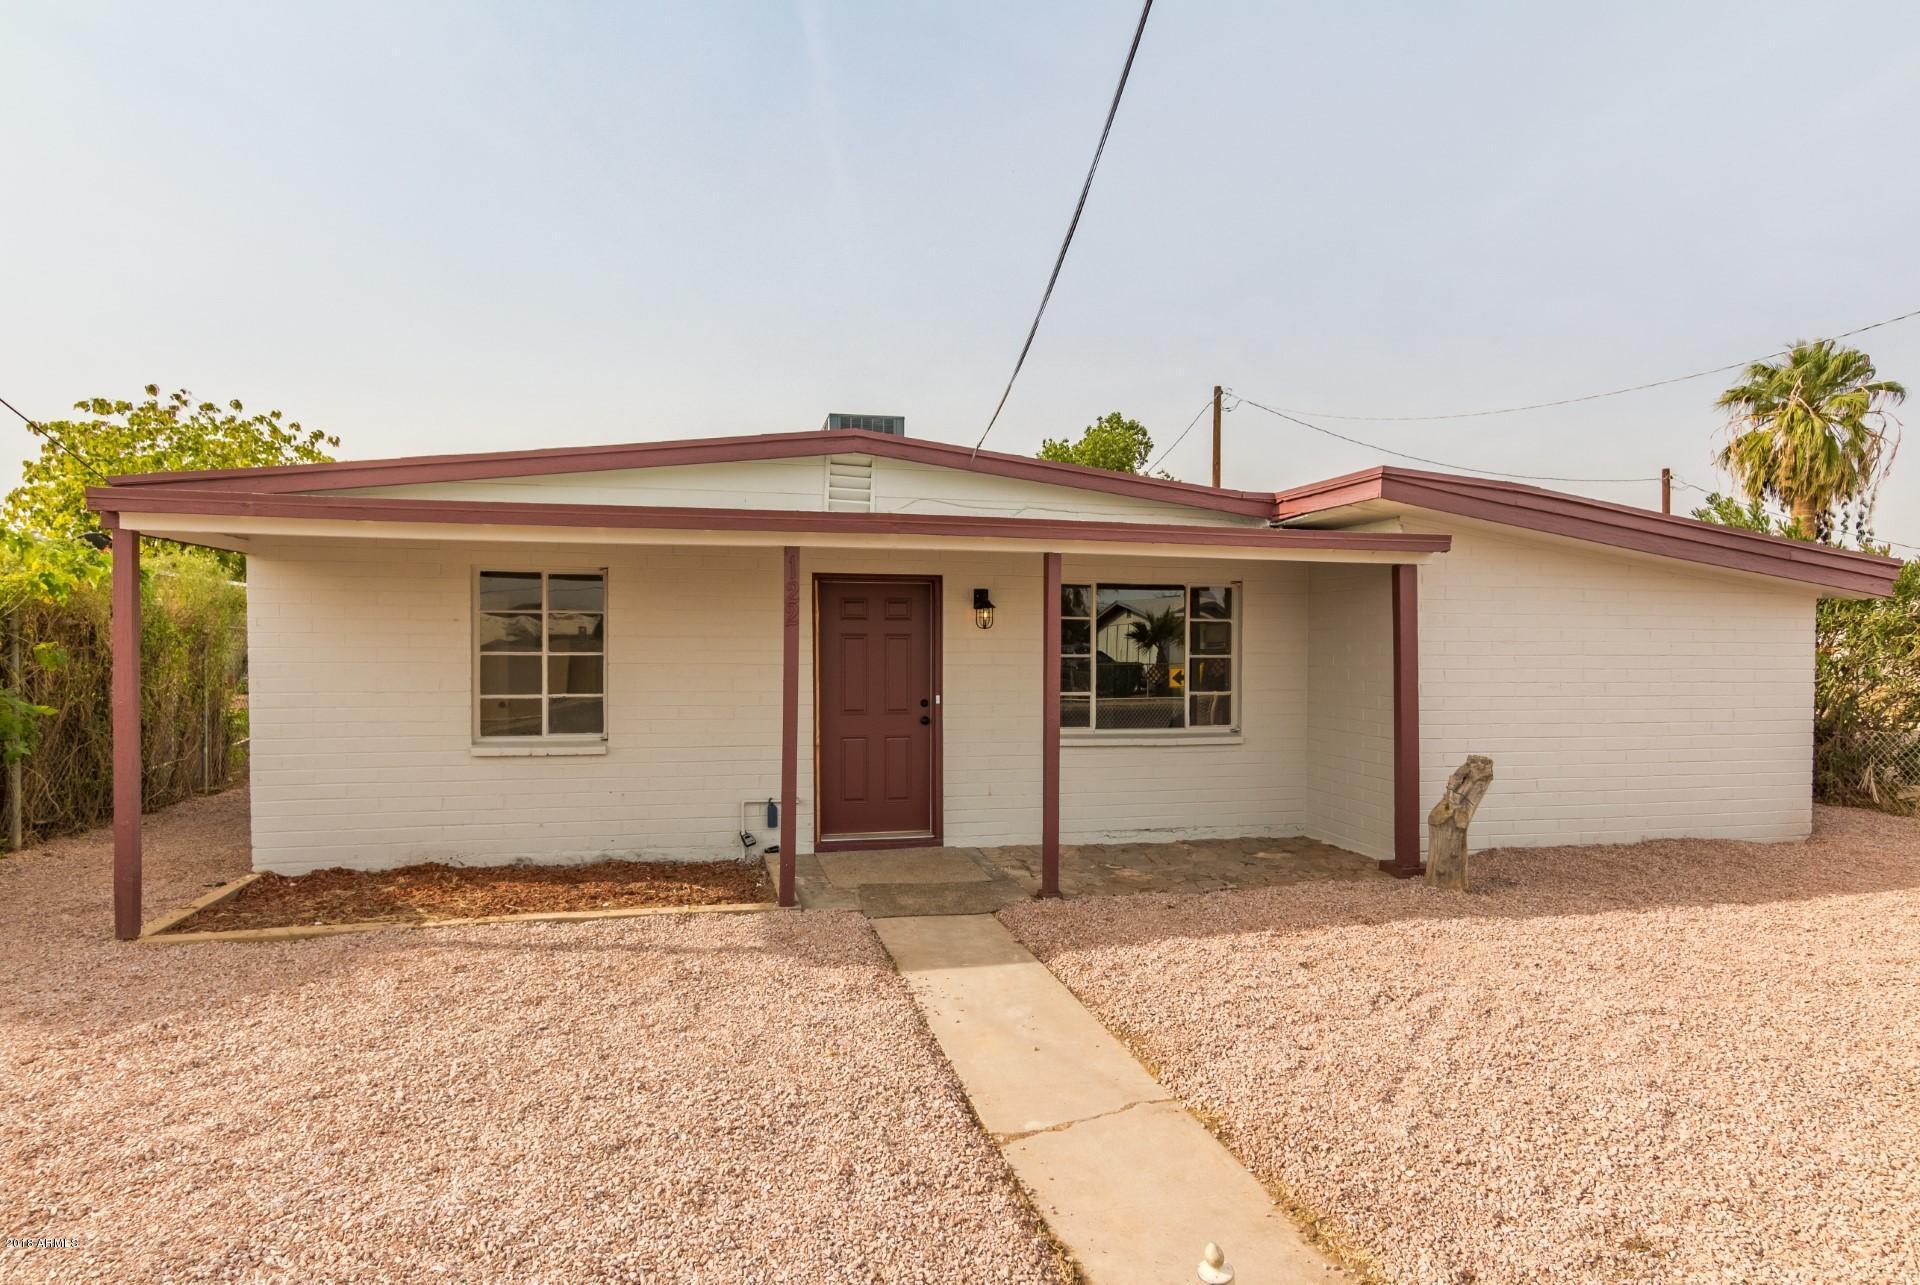 Photo of 122 N 5TH Street, Avondale, AZ 85323